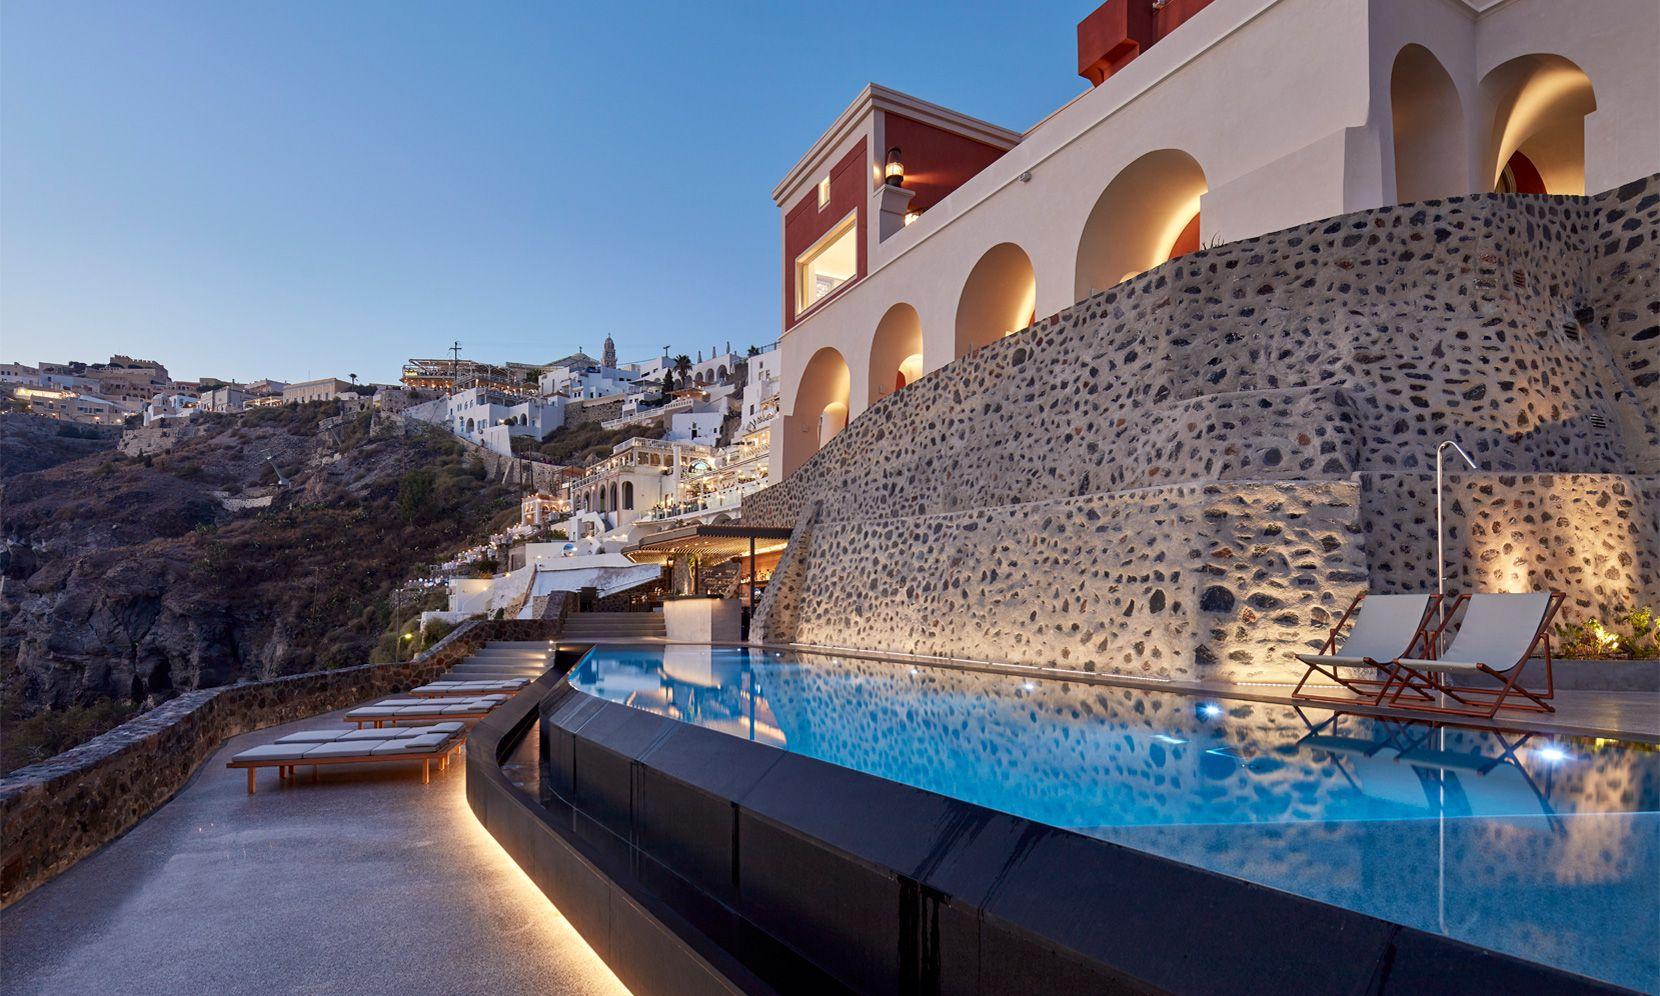 Santorini Villa Sonata jumbotron image